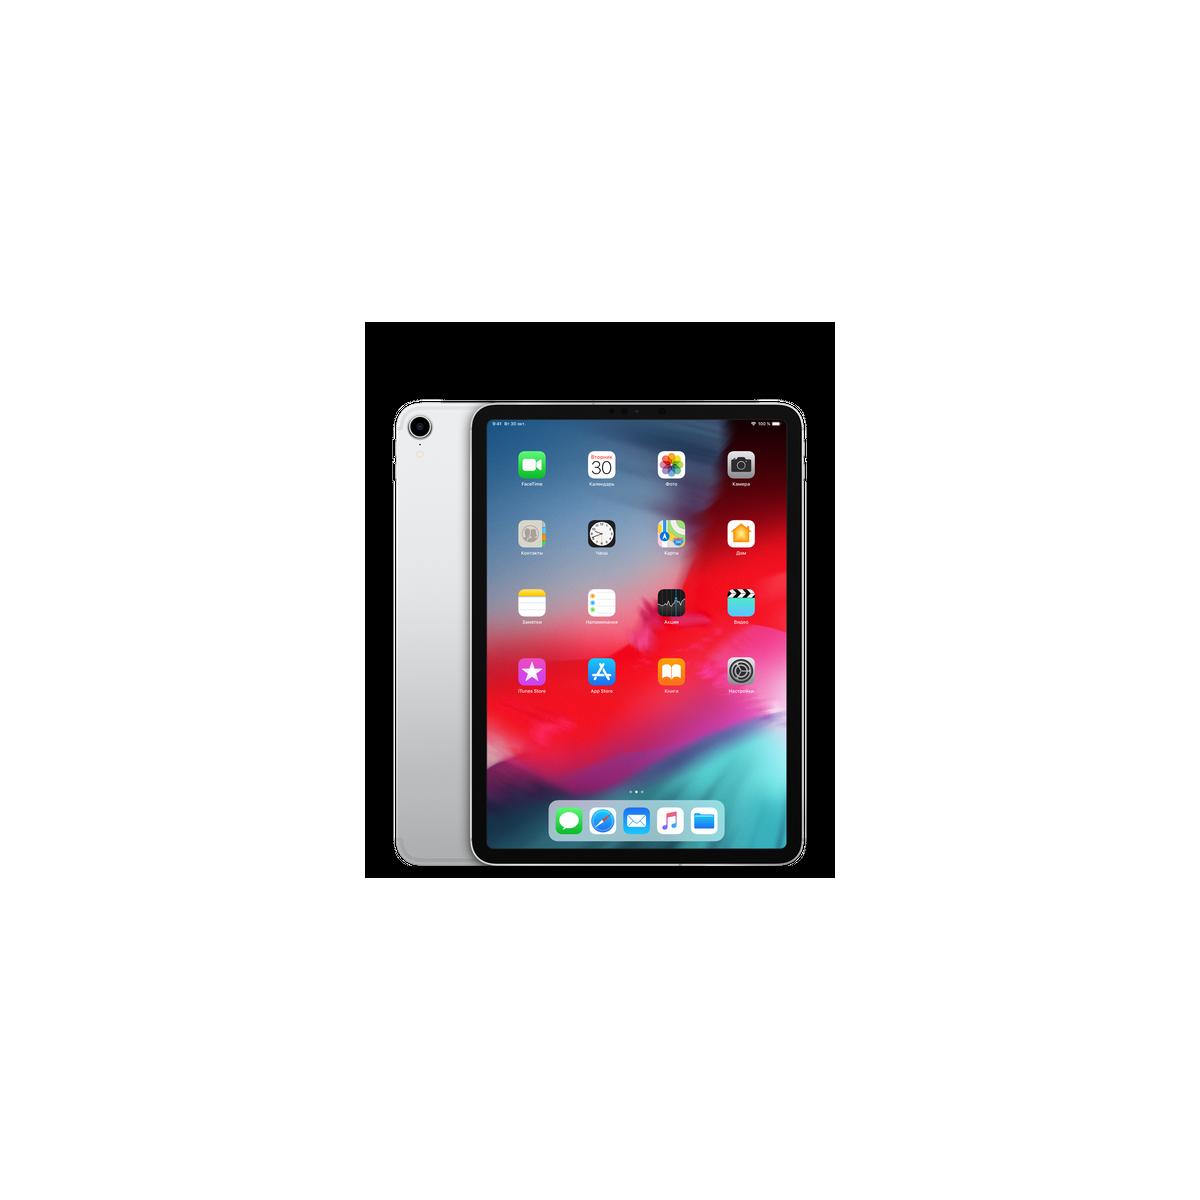 Apple iPad Pro 11 2018 Wi-Fi + LTE 1TB Silver